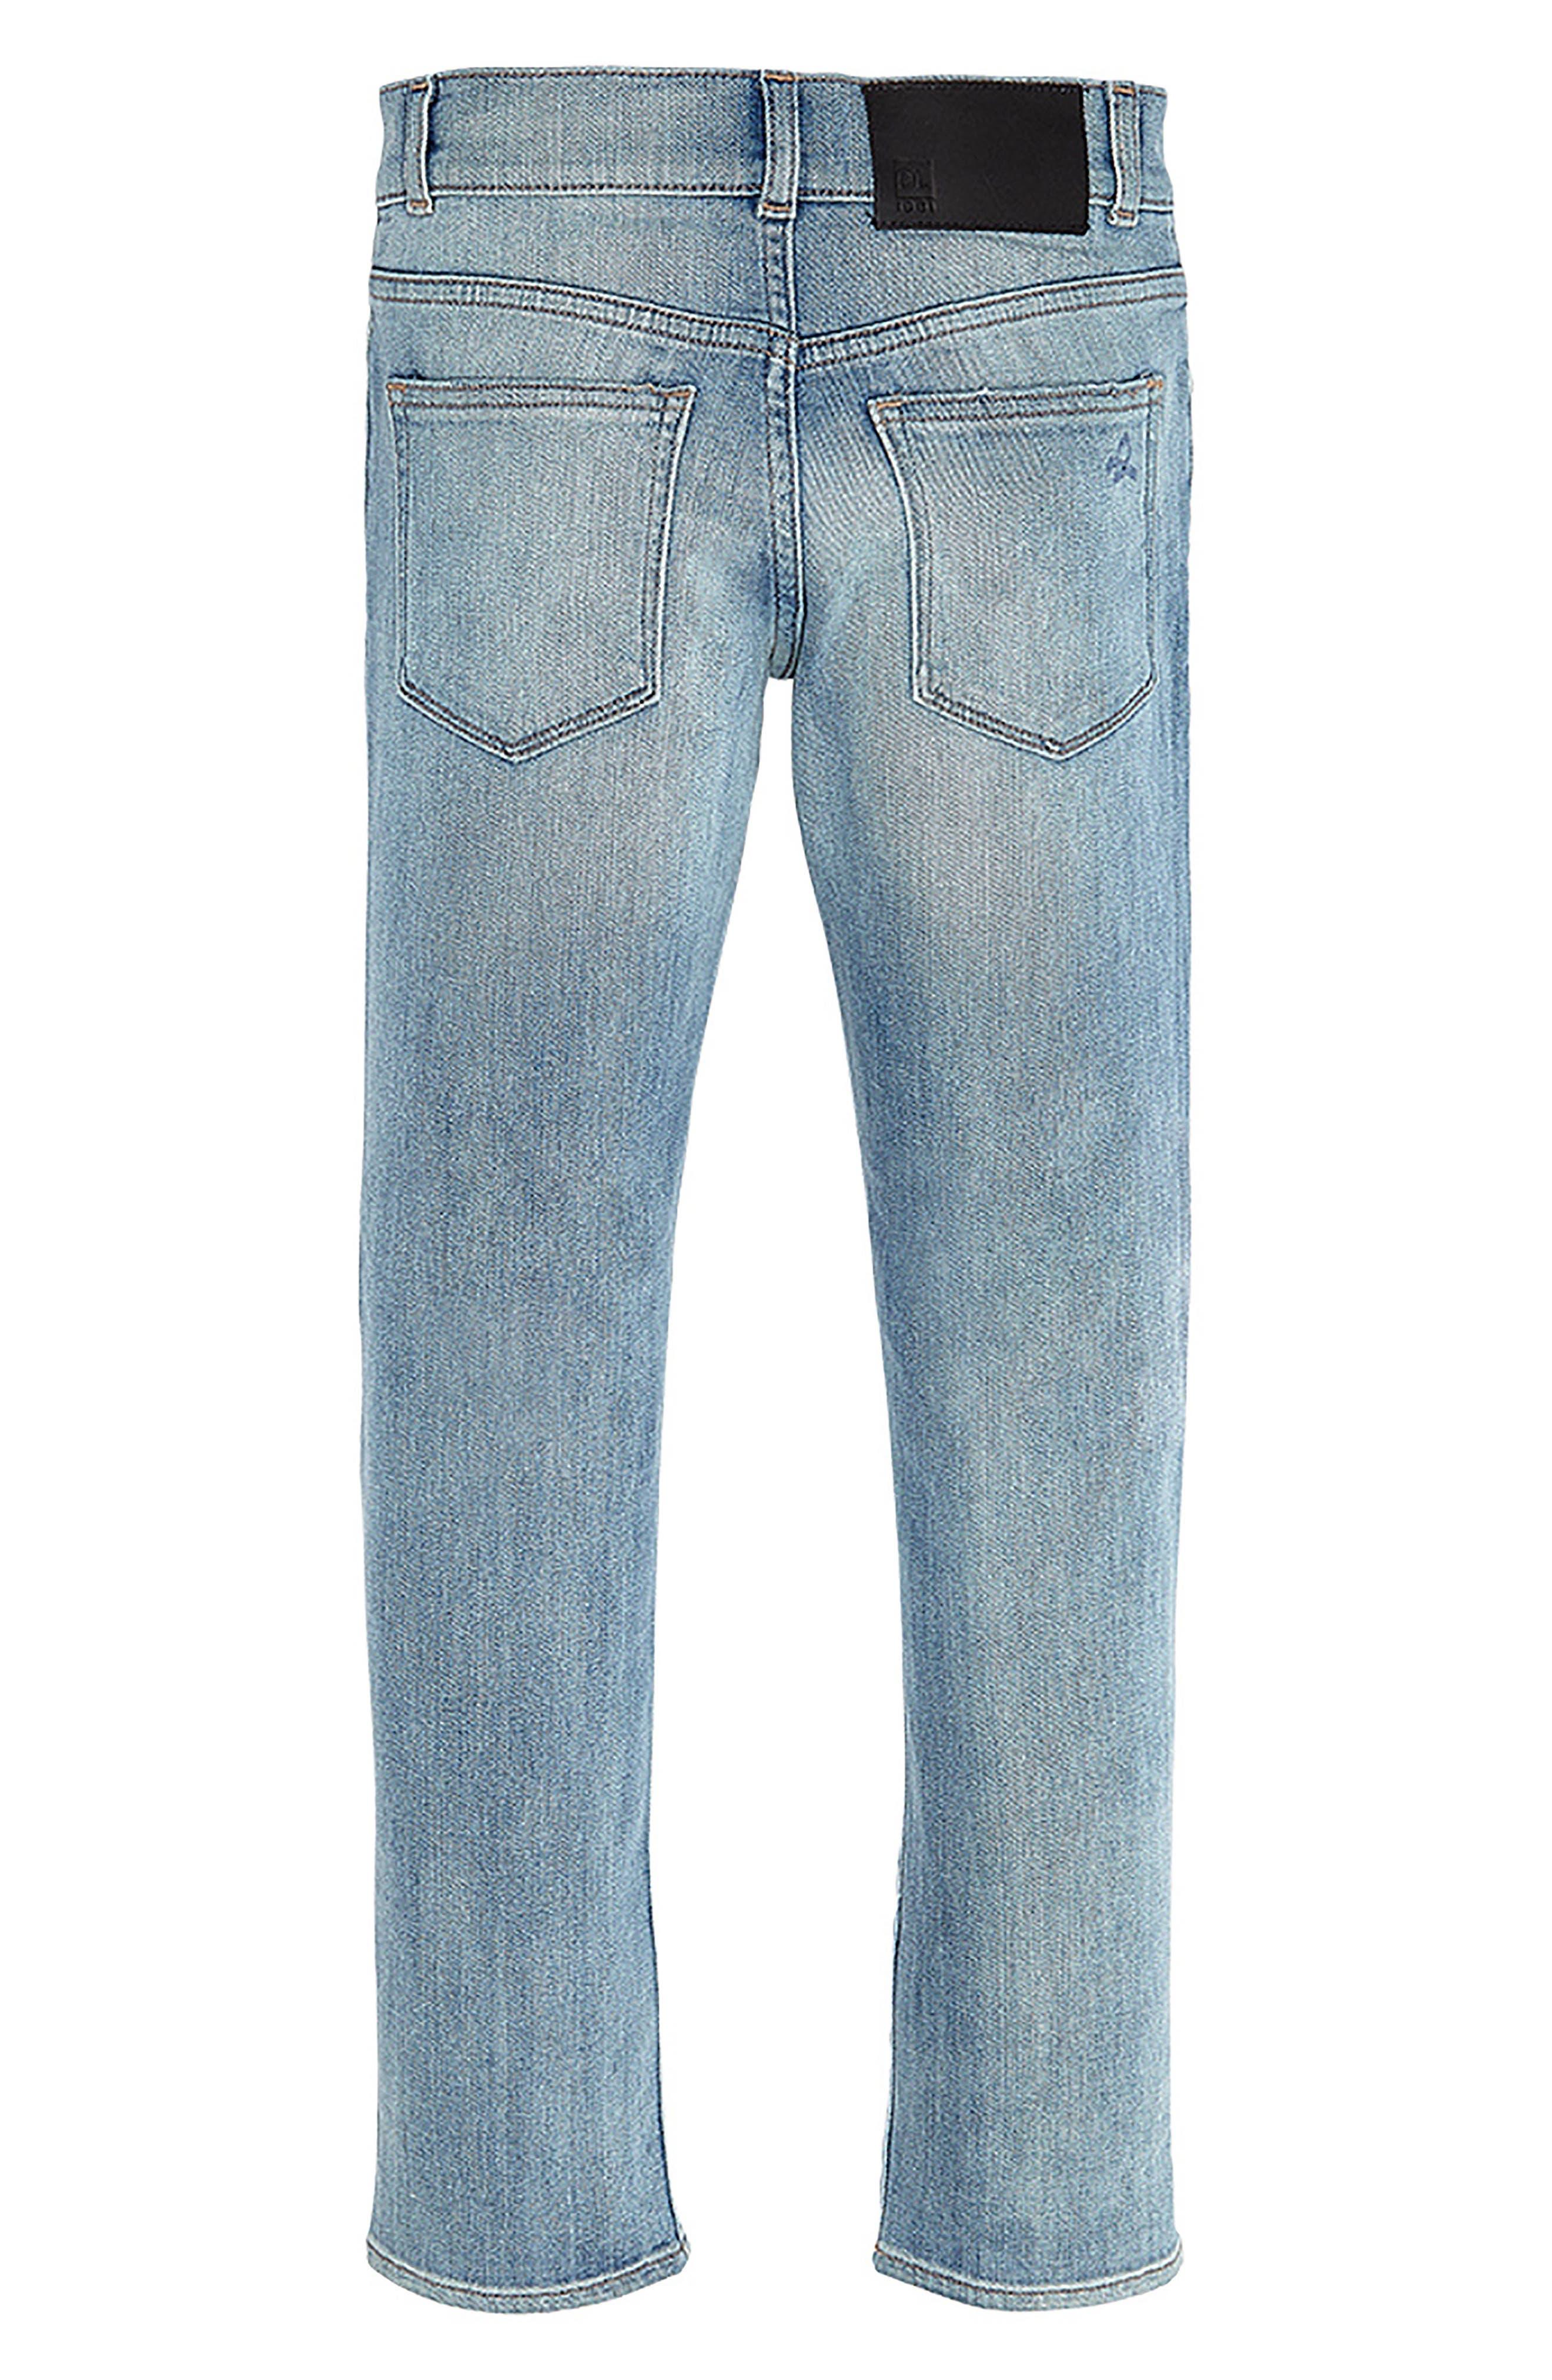 DL 1961 Hawke Skinny Jeans,                             Alternate thumbnail 2, color,                             Brain Freeze